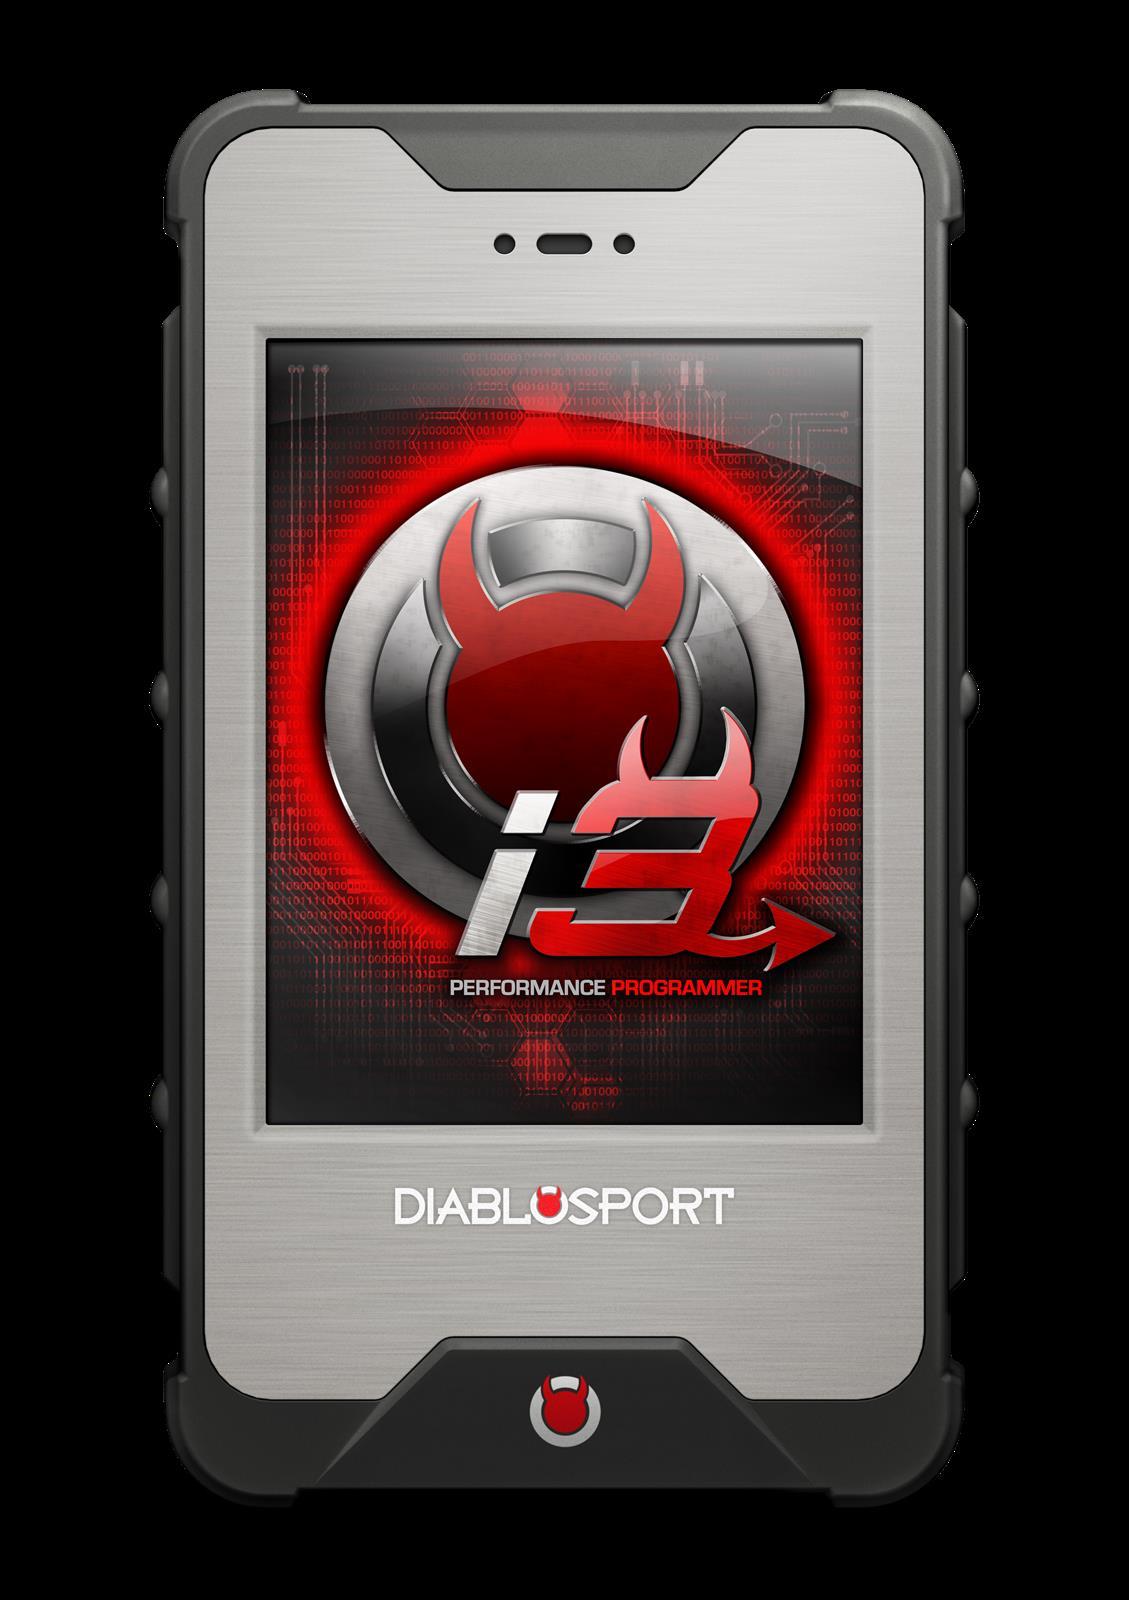 DiabloSport inTune i3 Platinum Computer Programmers 8345